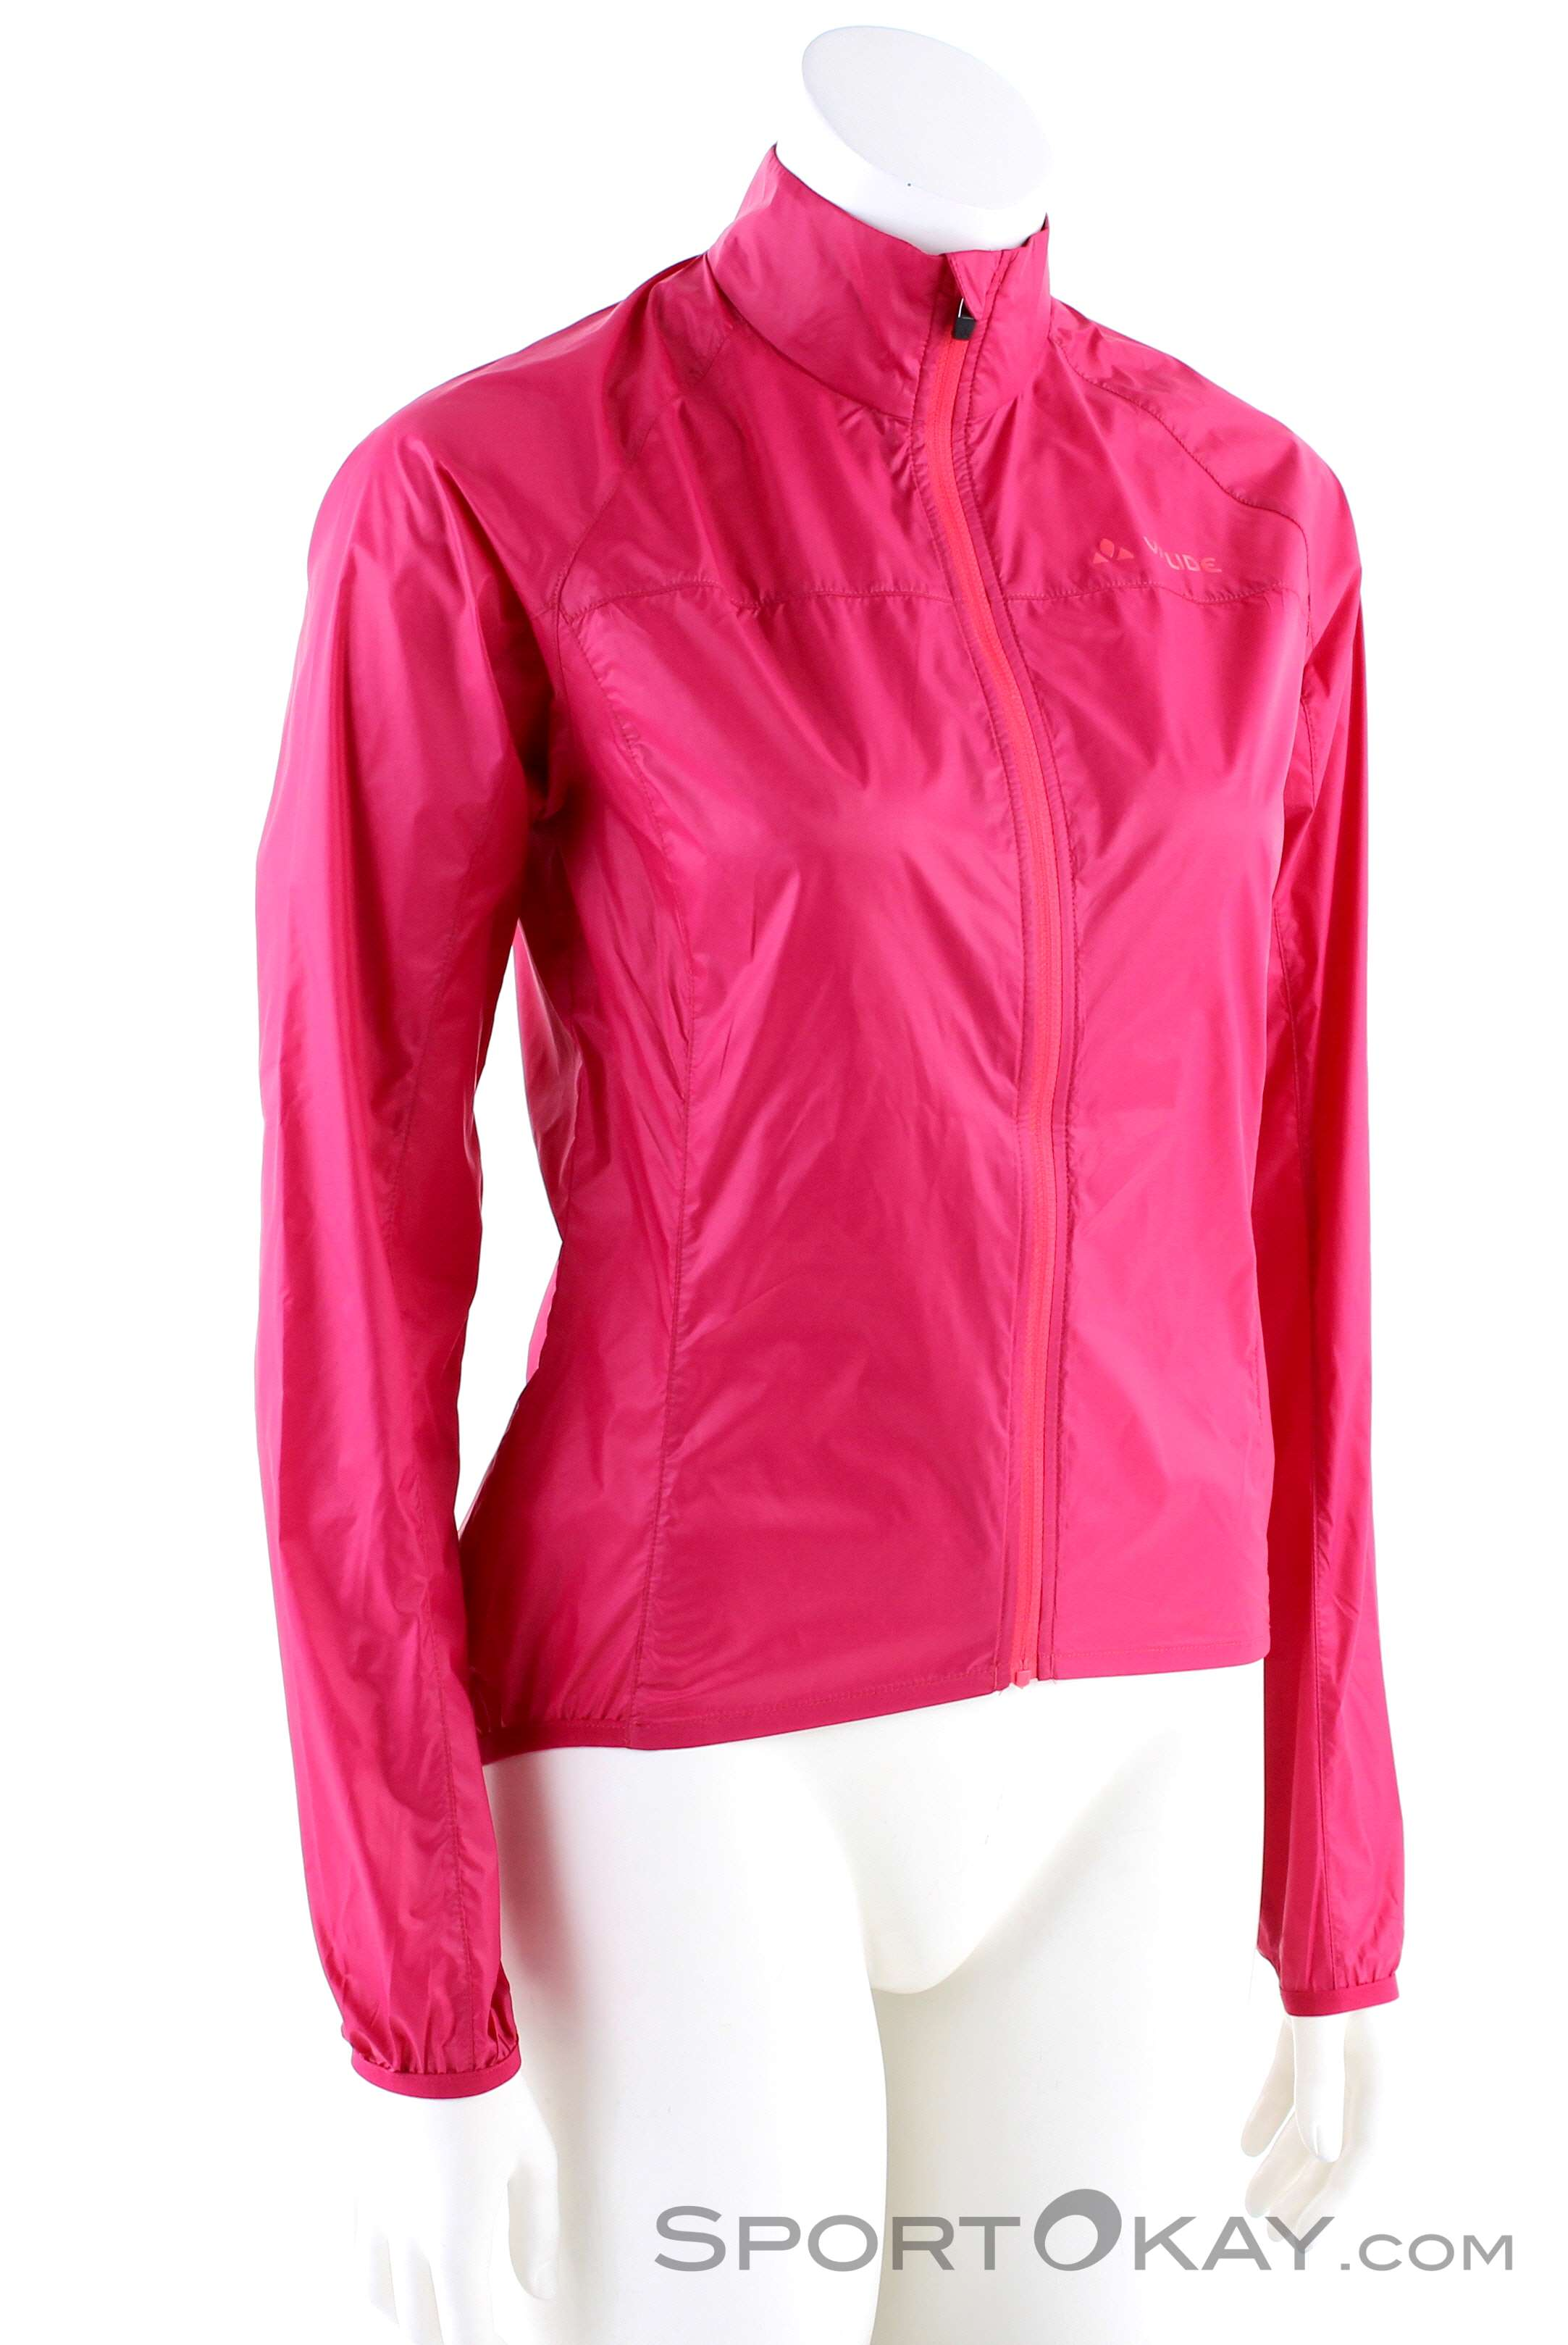 Scott Trail MTN 20 Damen Fahrrad Short Hose kurz pink 2018